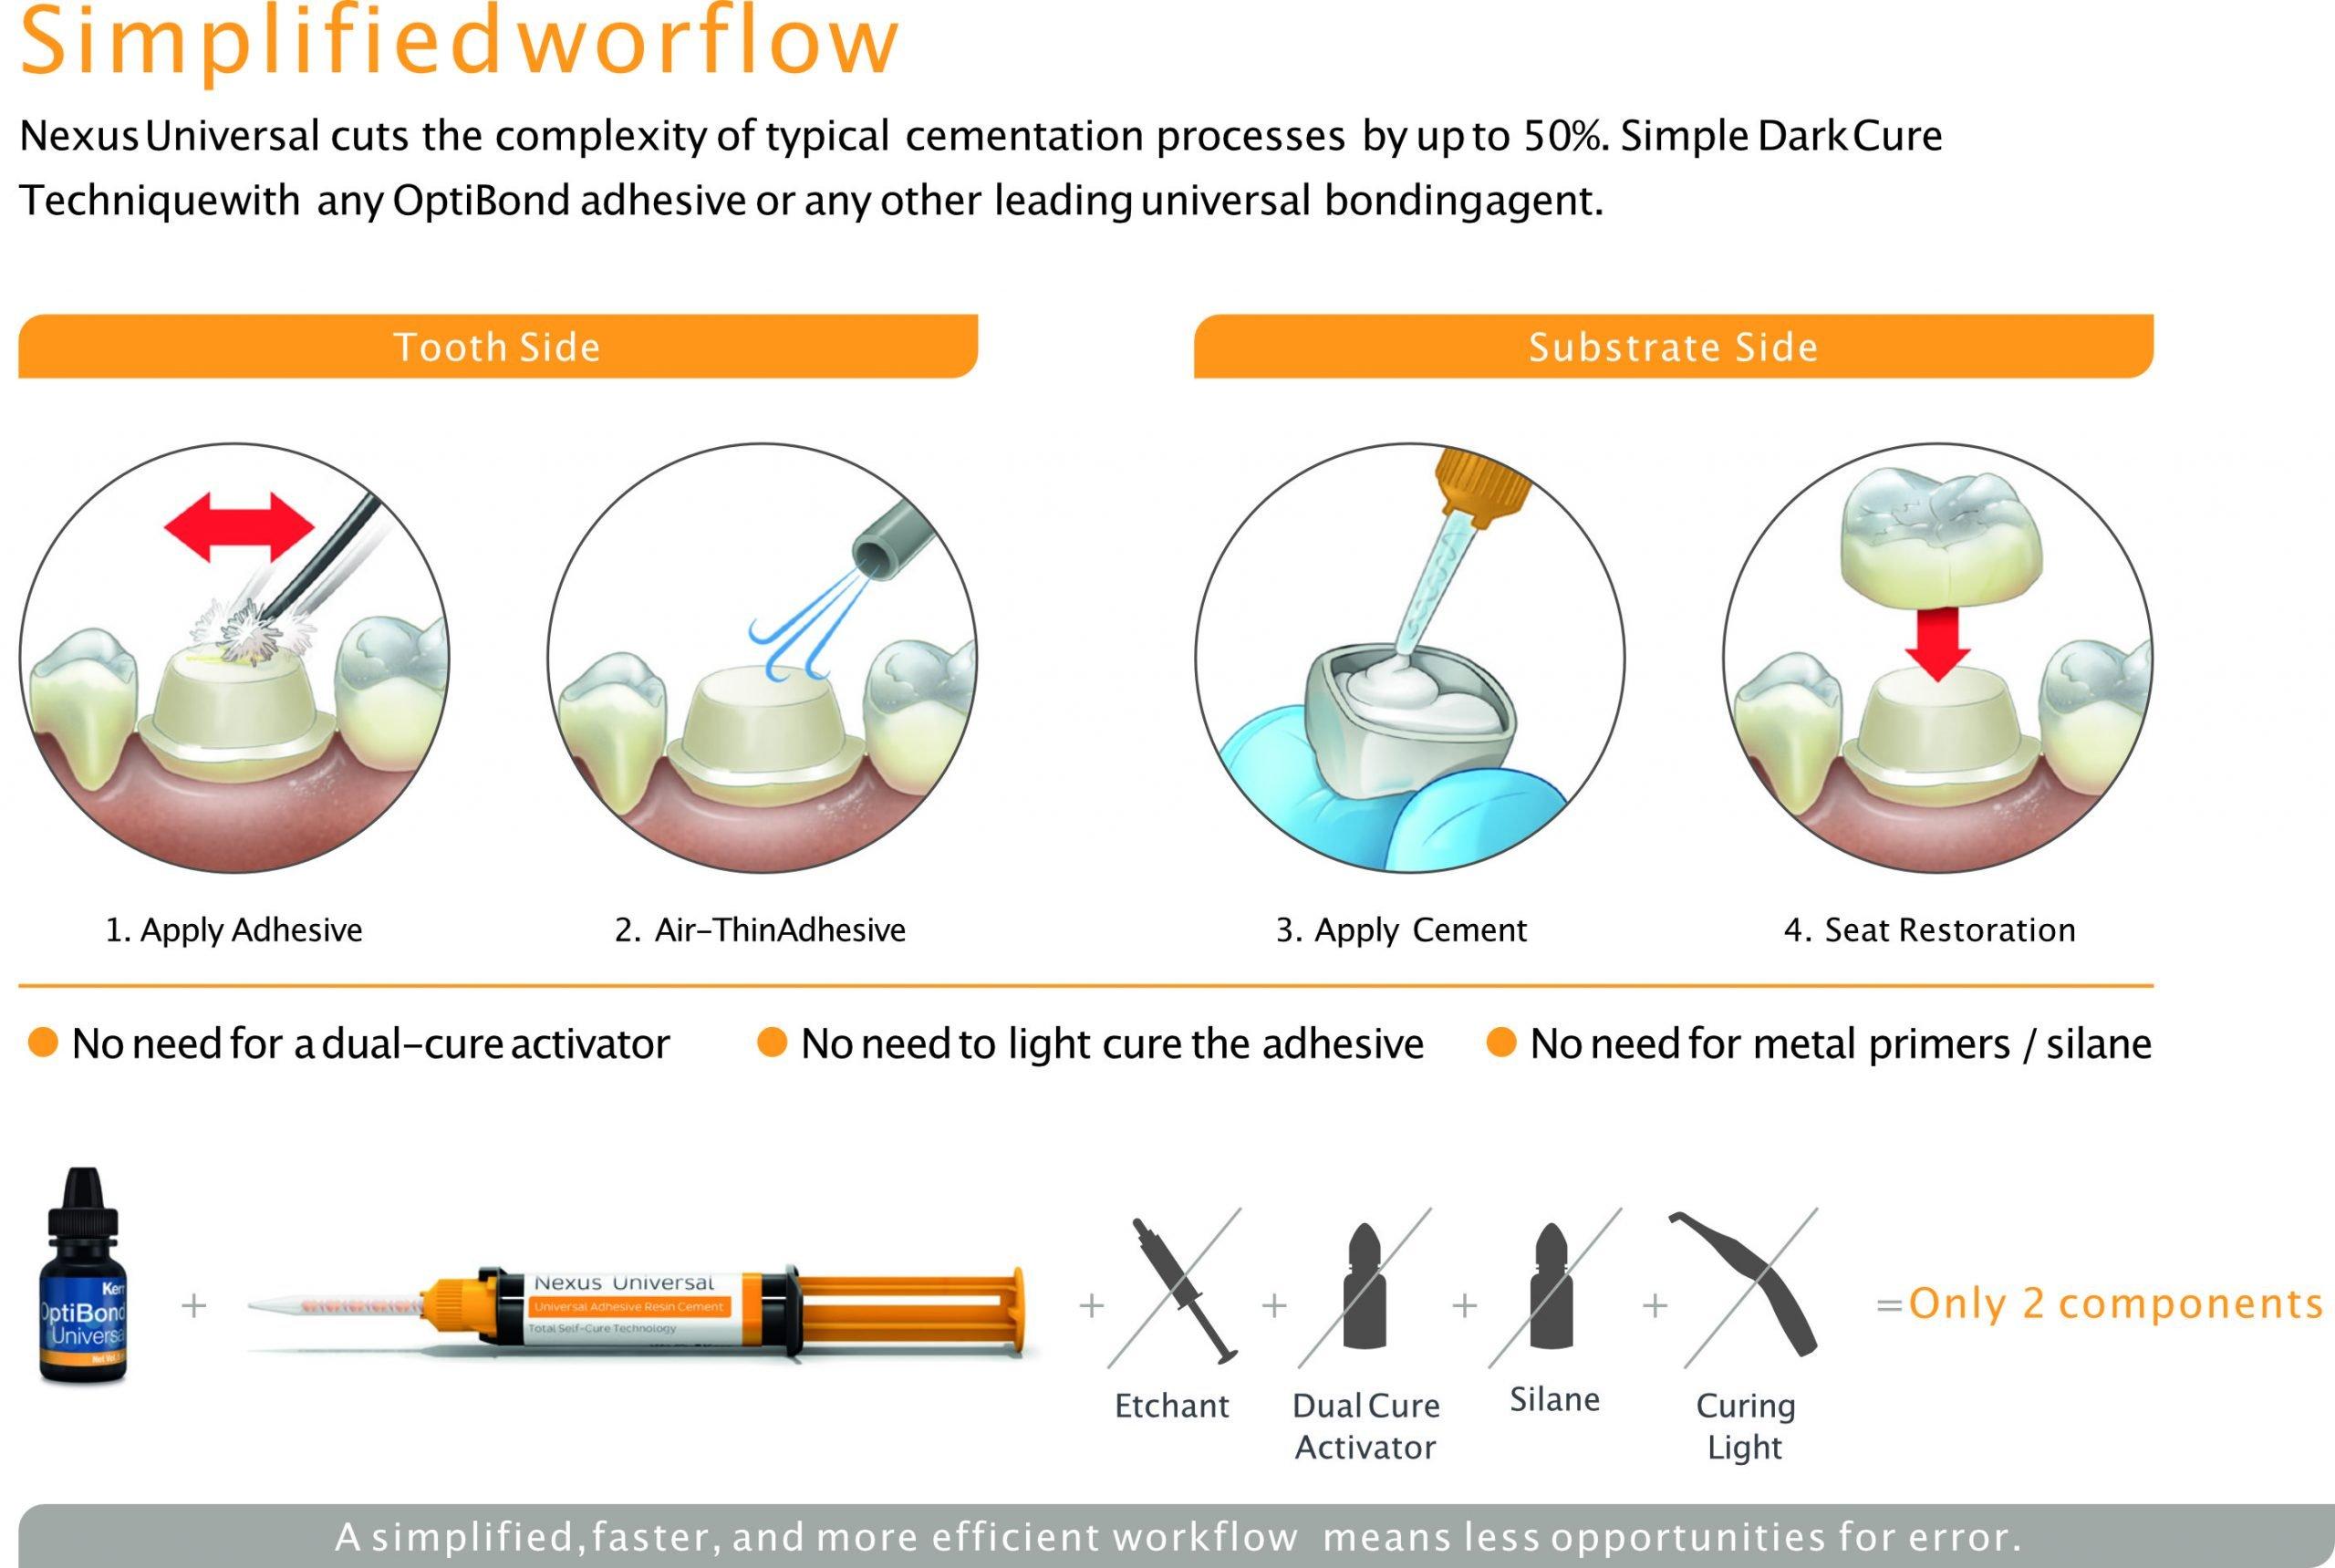 Vereenvoudigde workflow